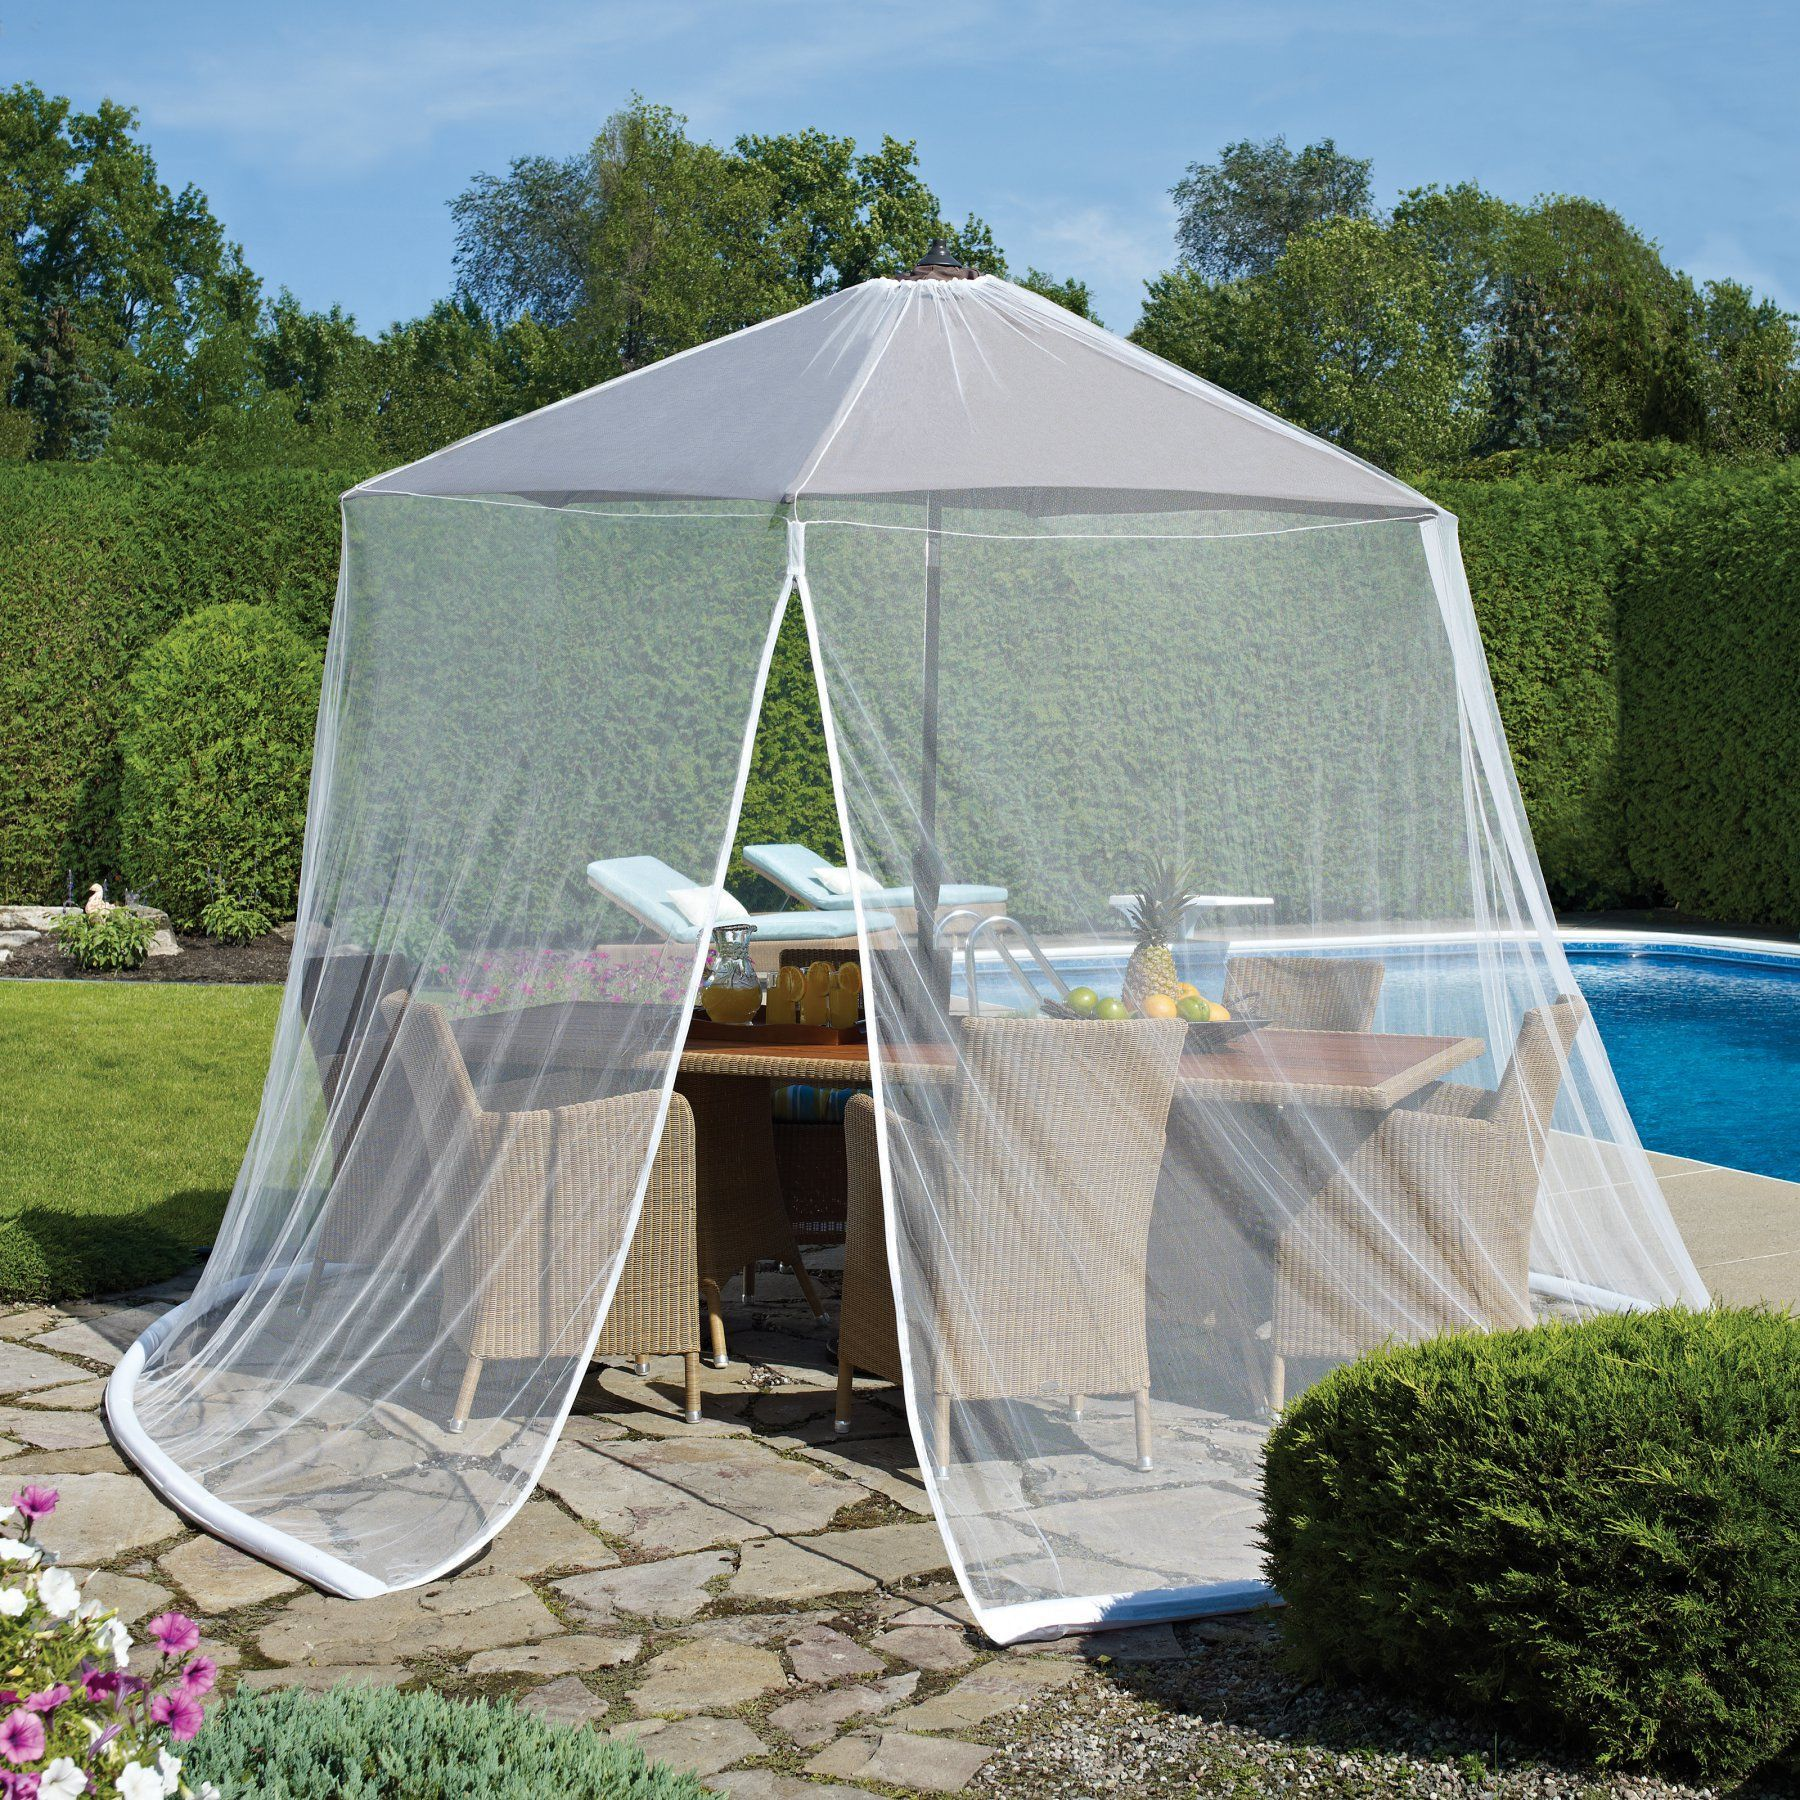 Outdoor Decor 11 Ft Scram Adjustable Mosquito Netting Outdoor Decor Canopy Outdoor Outdoor Umbrella